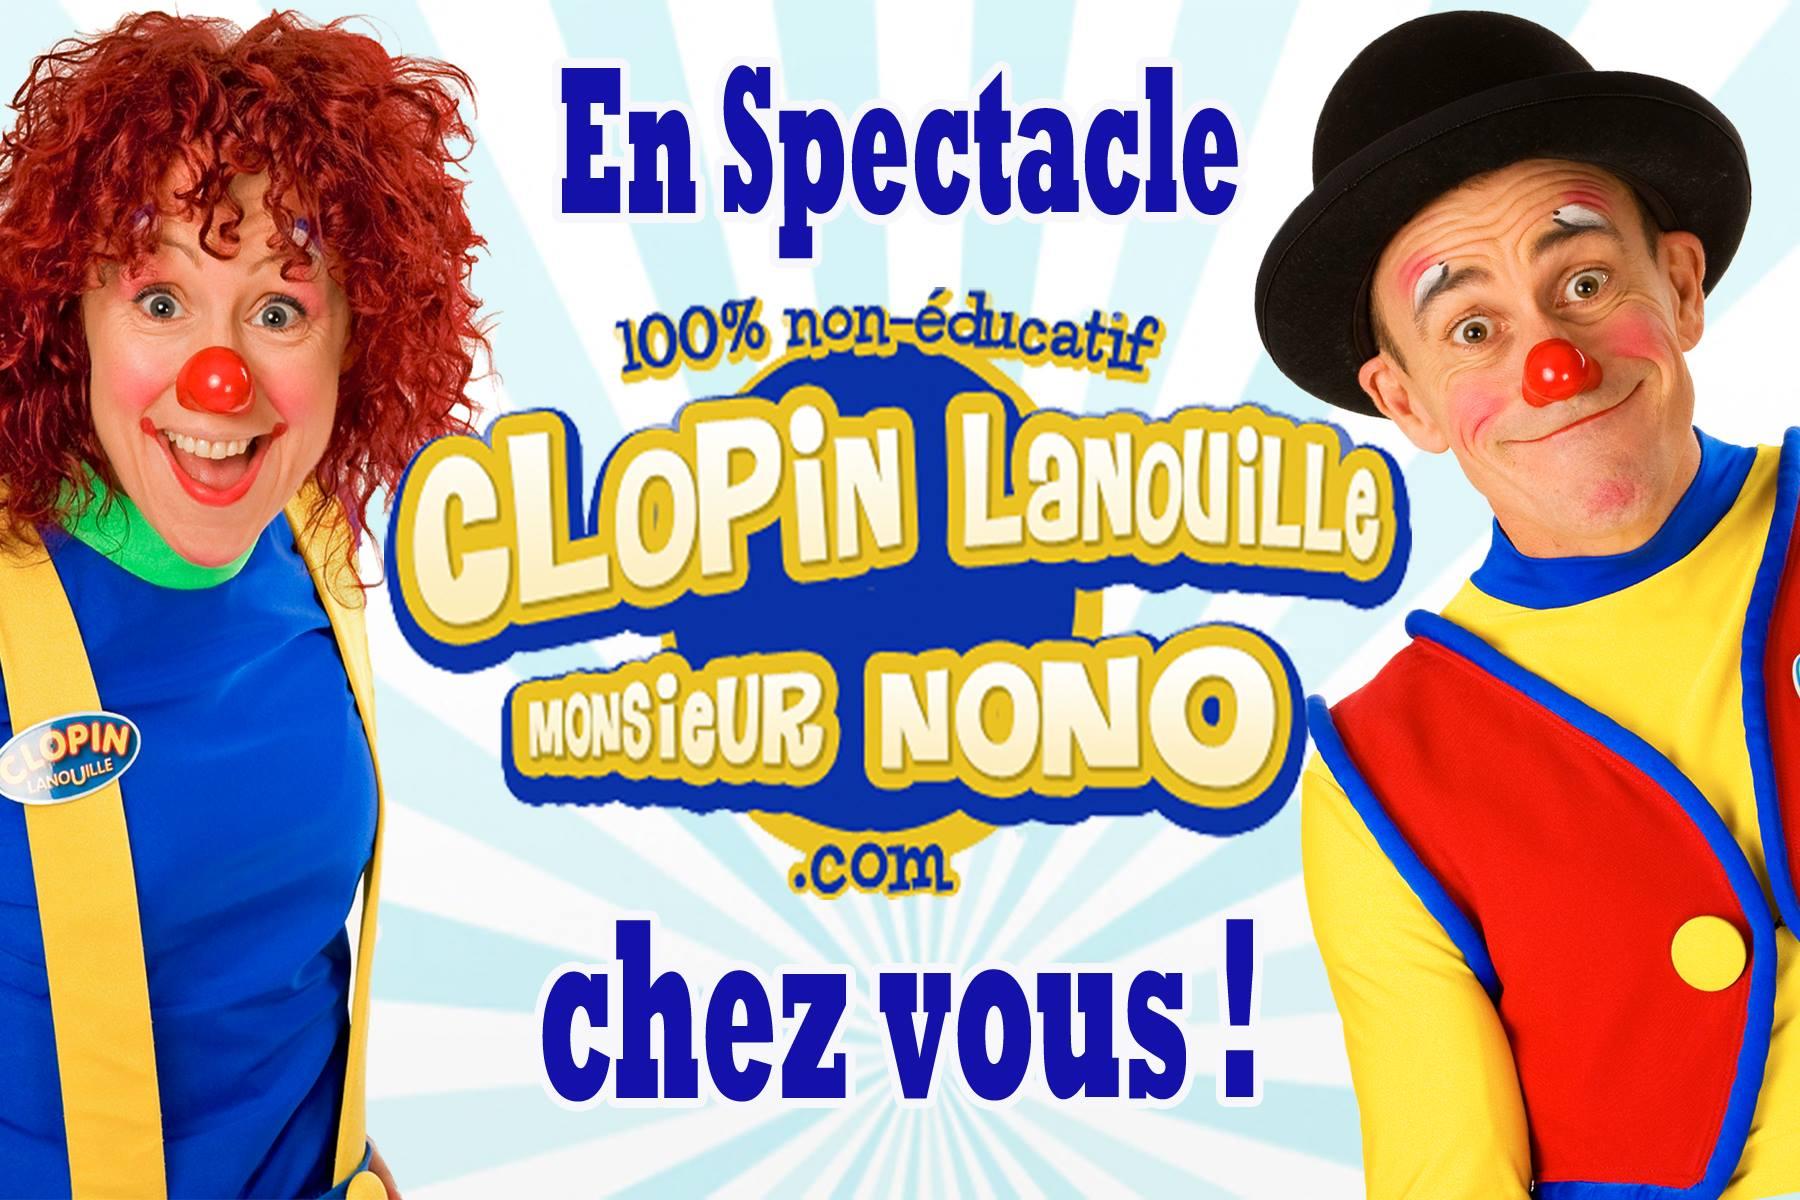 Clopin Lanouille et Monsieur Nono